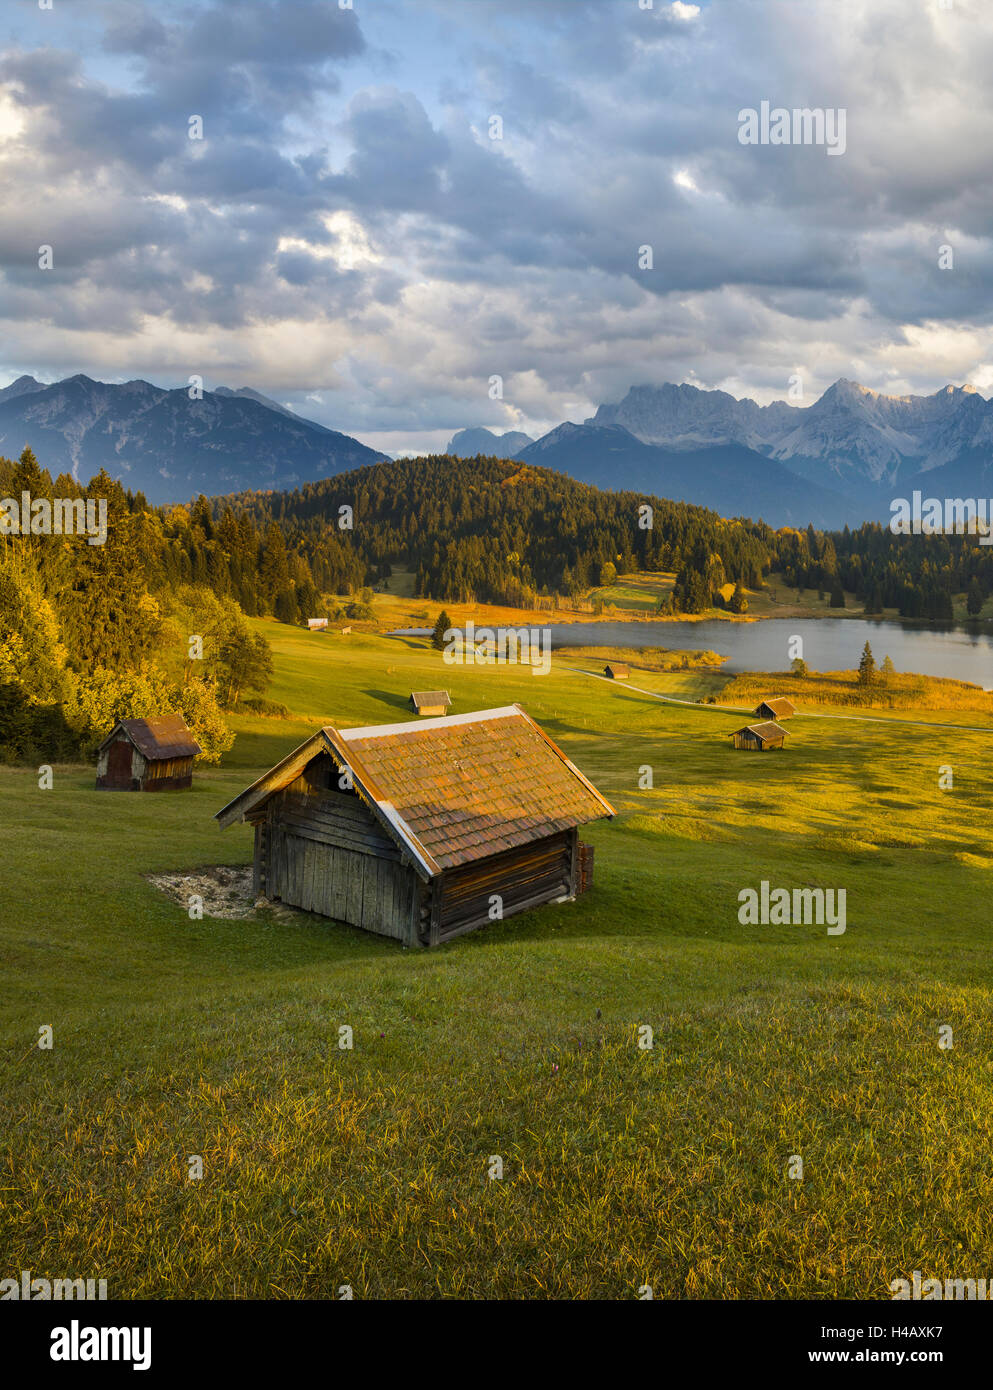 Geroldsee, Karwendel, Upper Bavaria, Bavaria, Germany - Stock Image